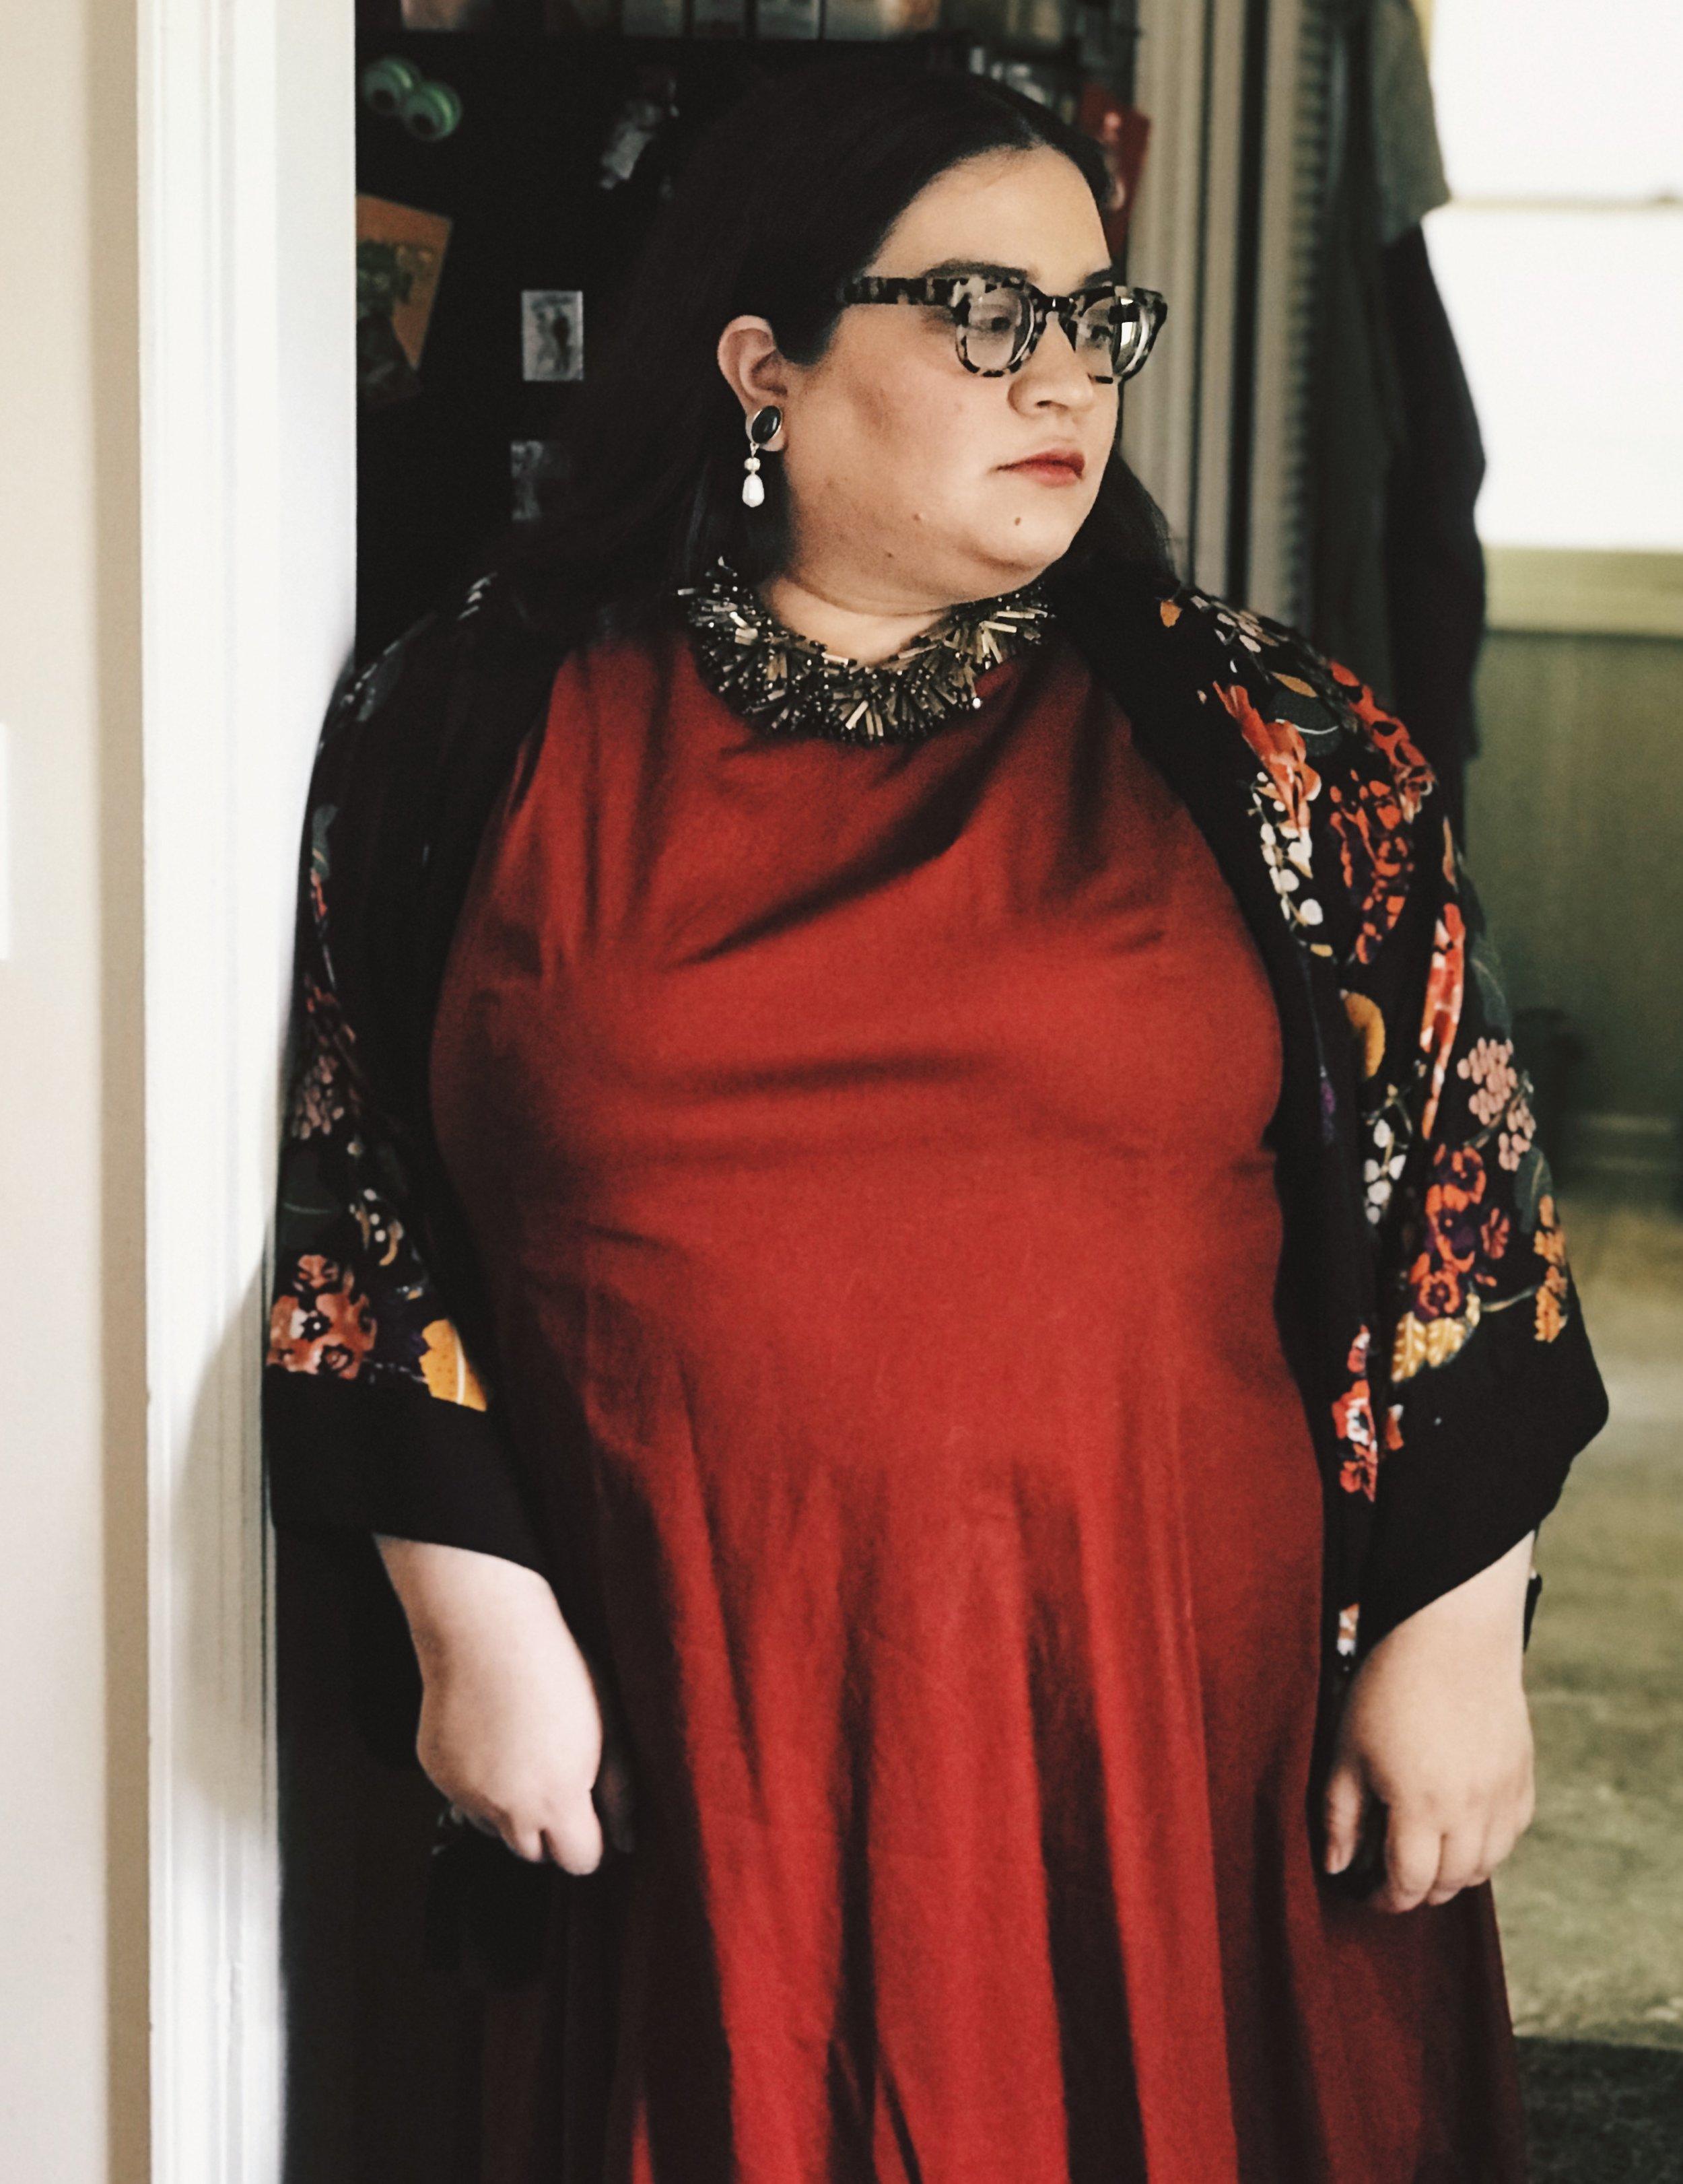 Raquel Reyes The Attic On Eighth Costalegre Style 2.jpeg